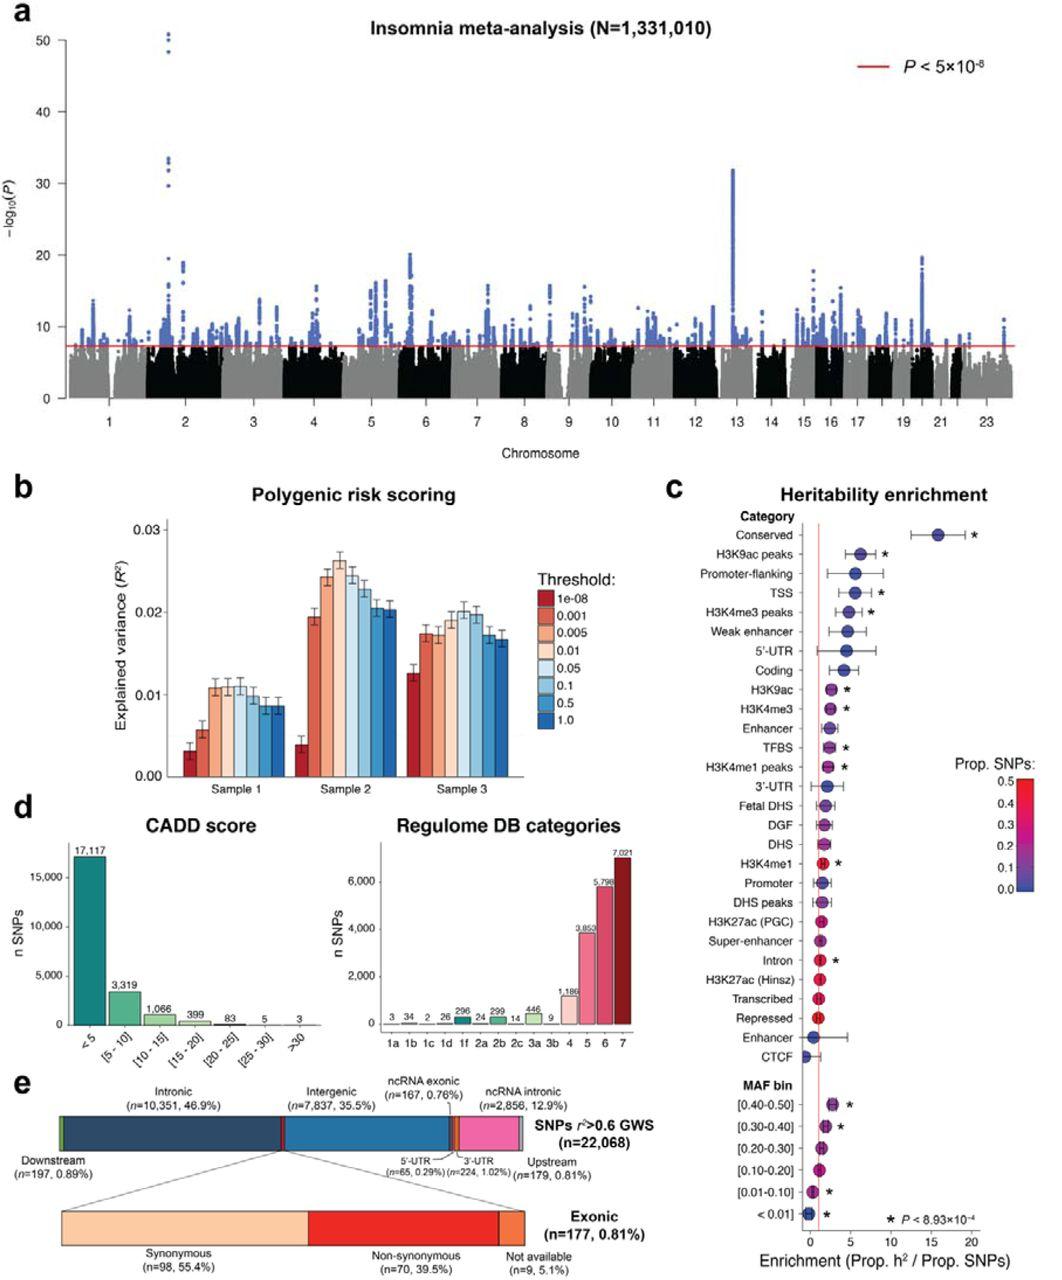 Genome-wide Analysis of Insomnia (N=1,331,010) Identifies Novel Loci